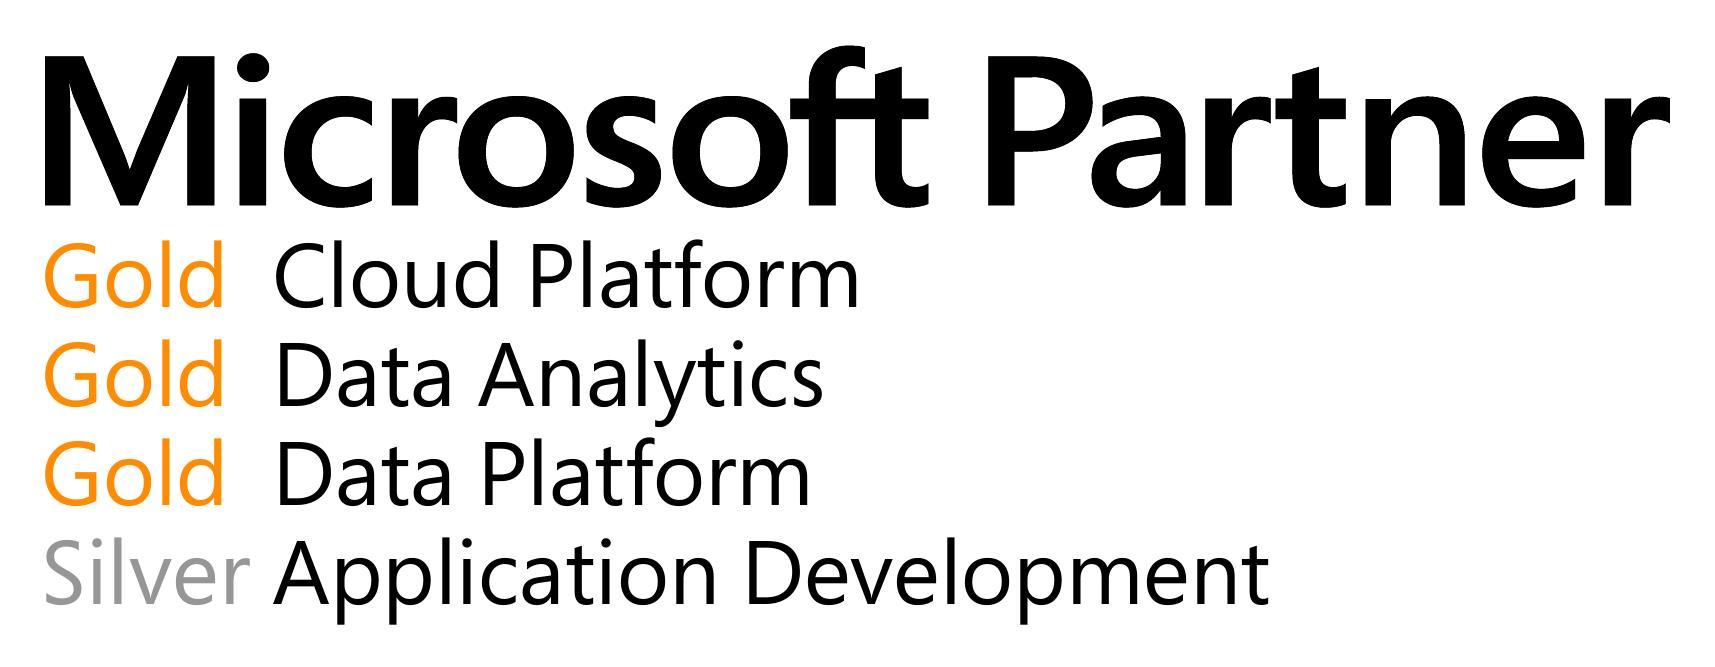 Microsoft_Partner_Logo.jpg